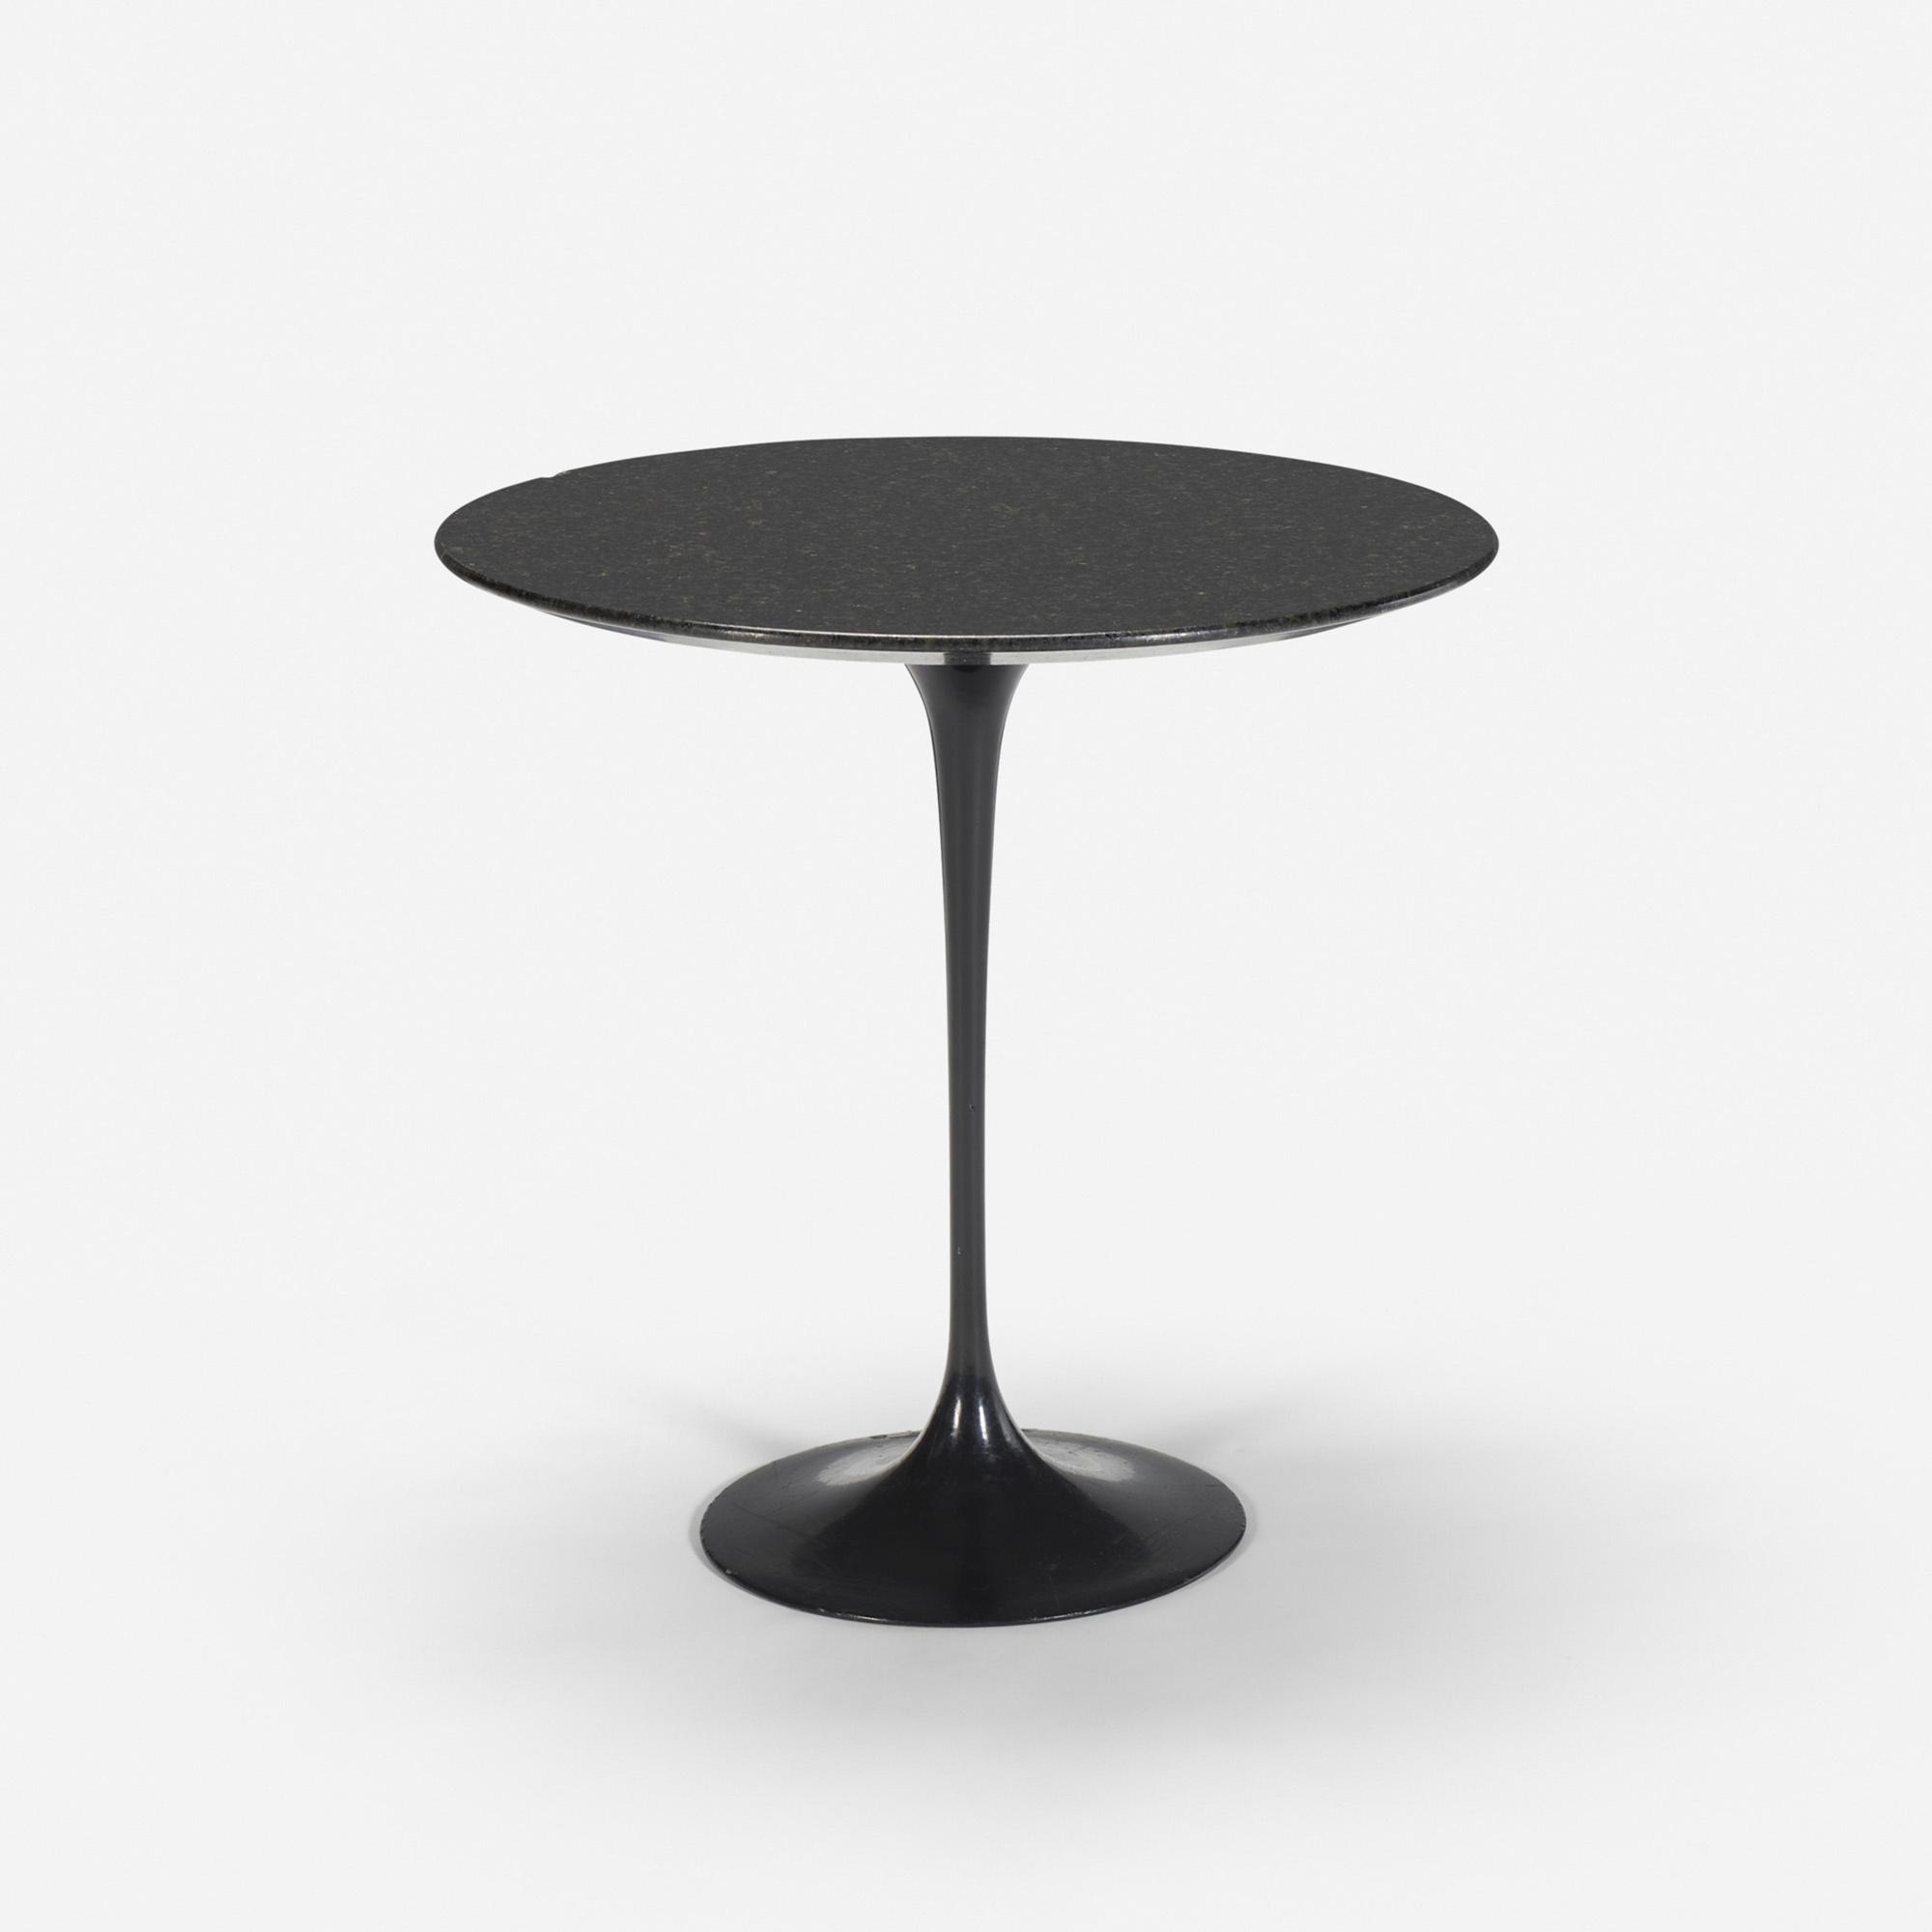 112: Eero Saarinen / Tulip table from the Grill Room (1 of 1)